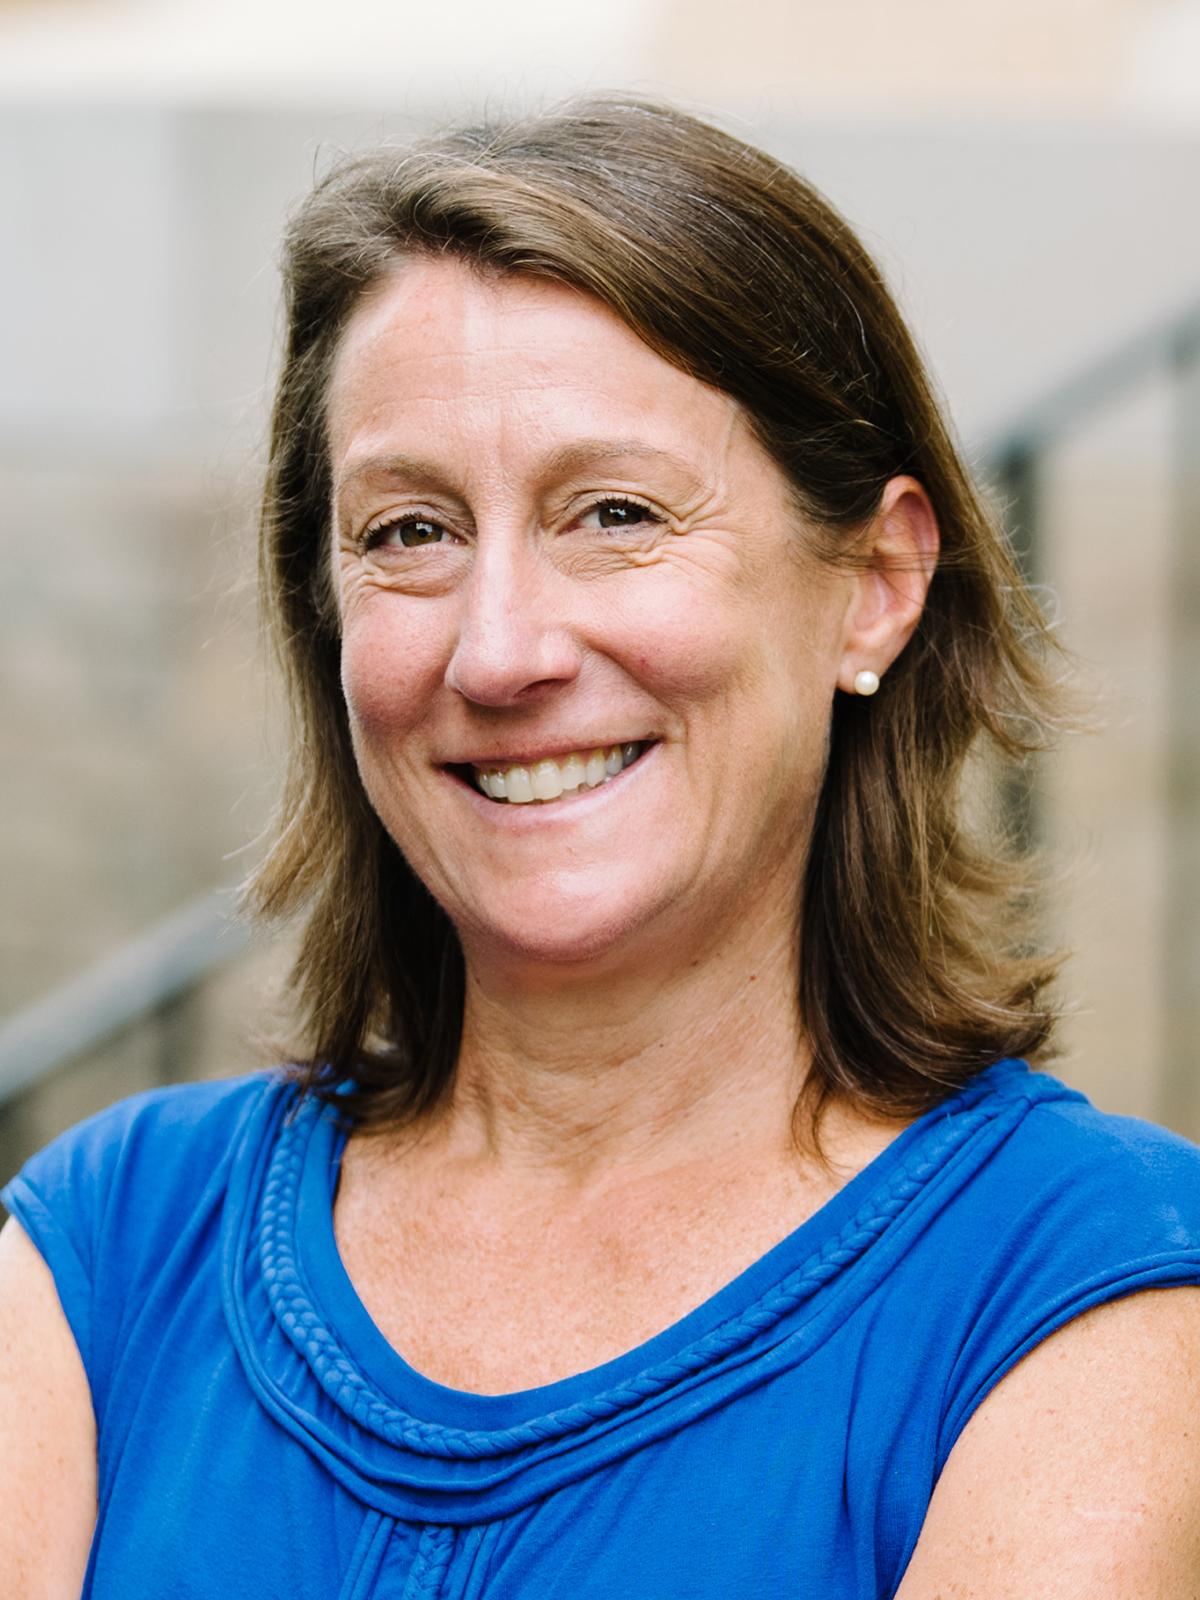 Cheryl Bolick portrait image